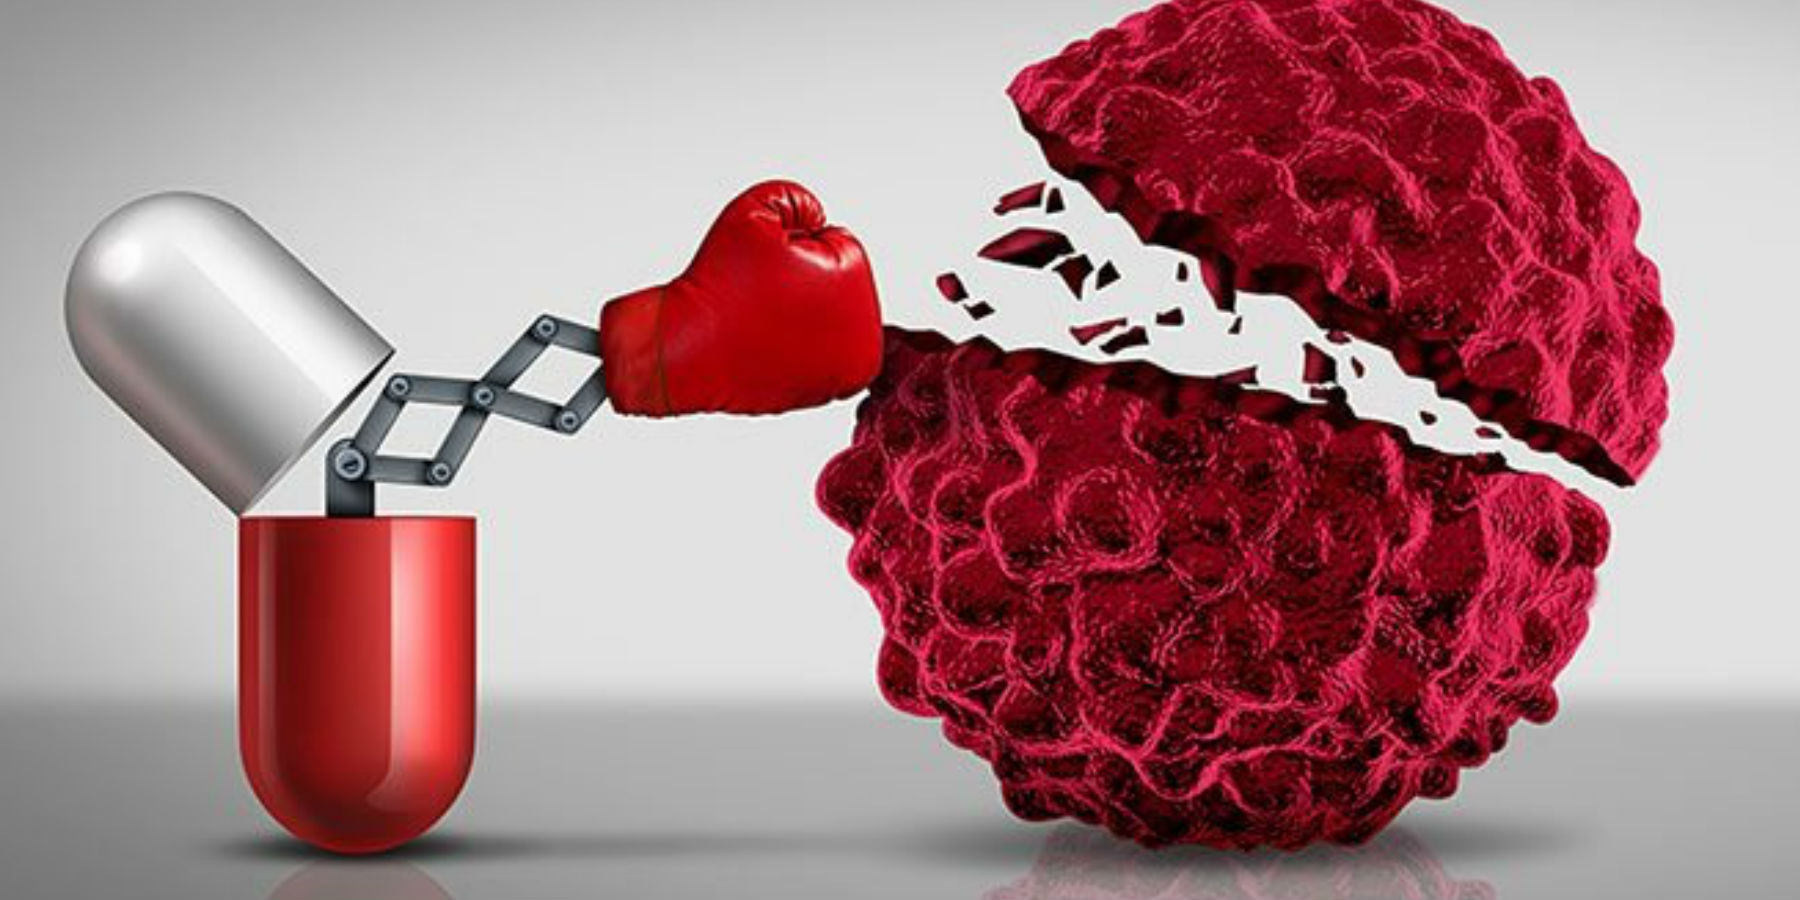 новое лекарство атакует рак из за генов